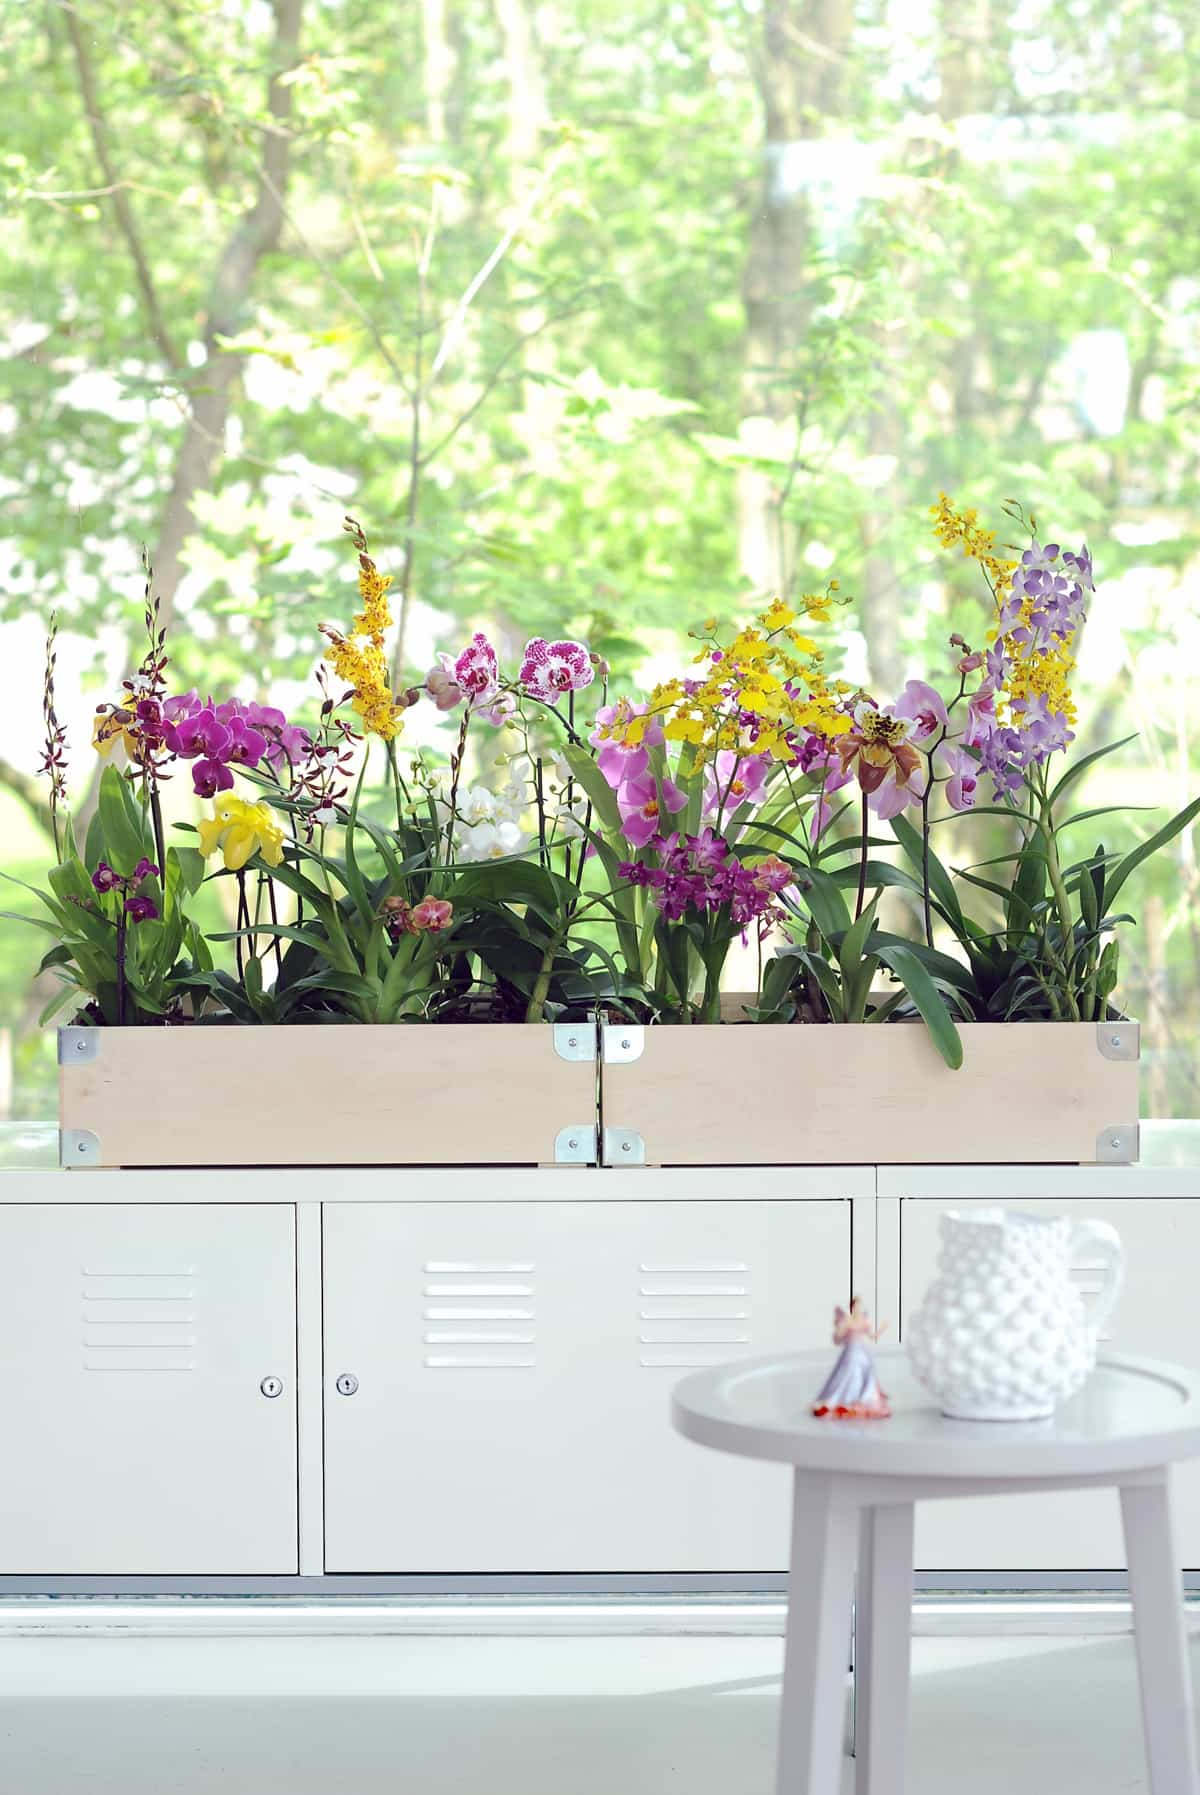 claves para decorar con orquideas tu hogar 5